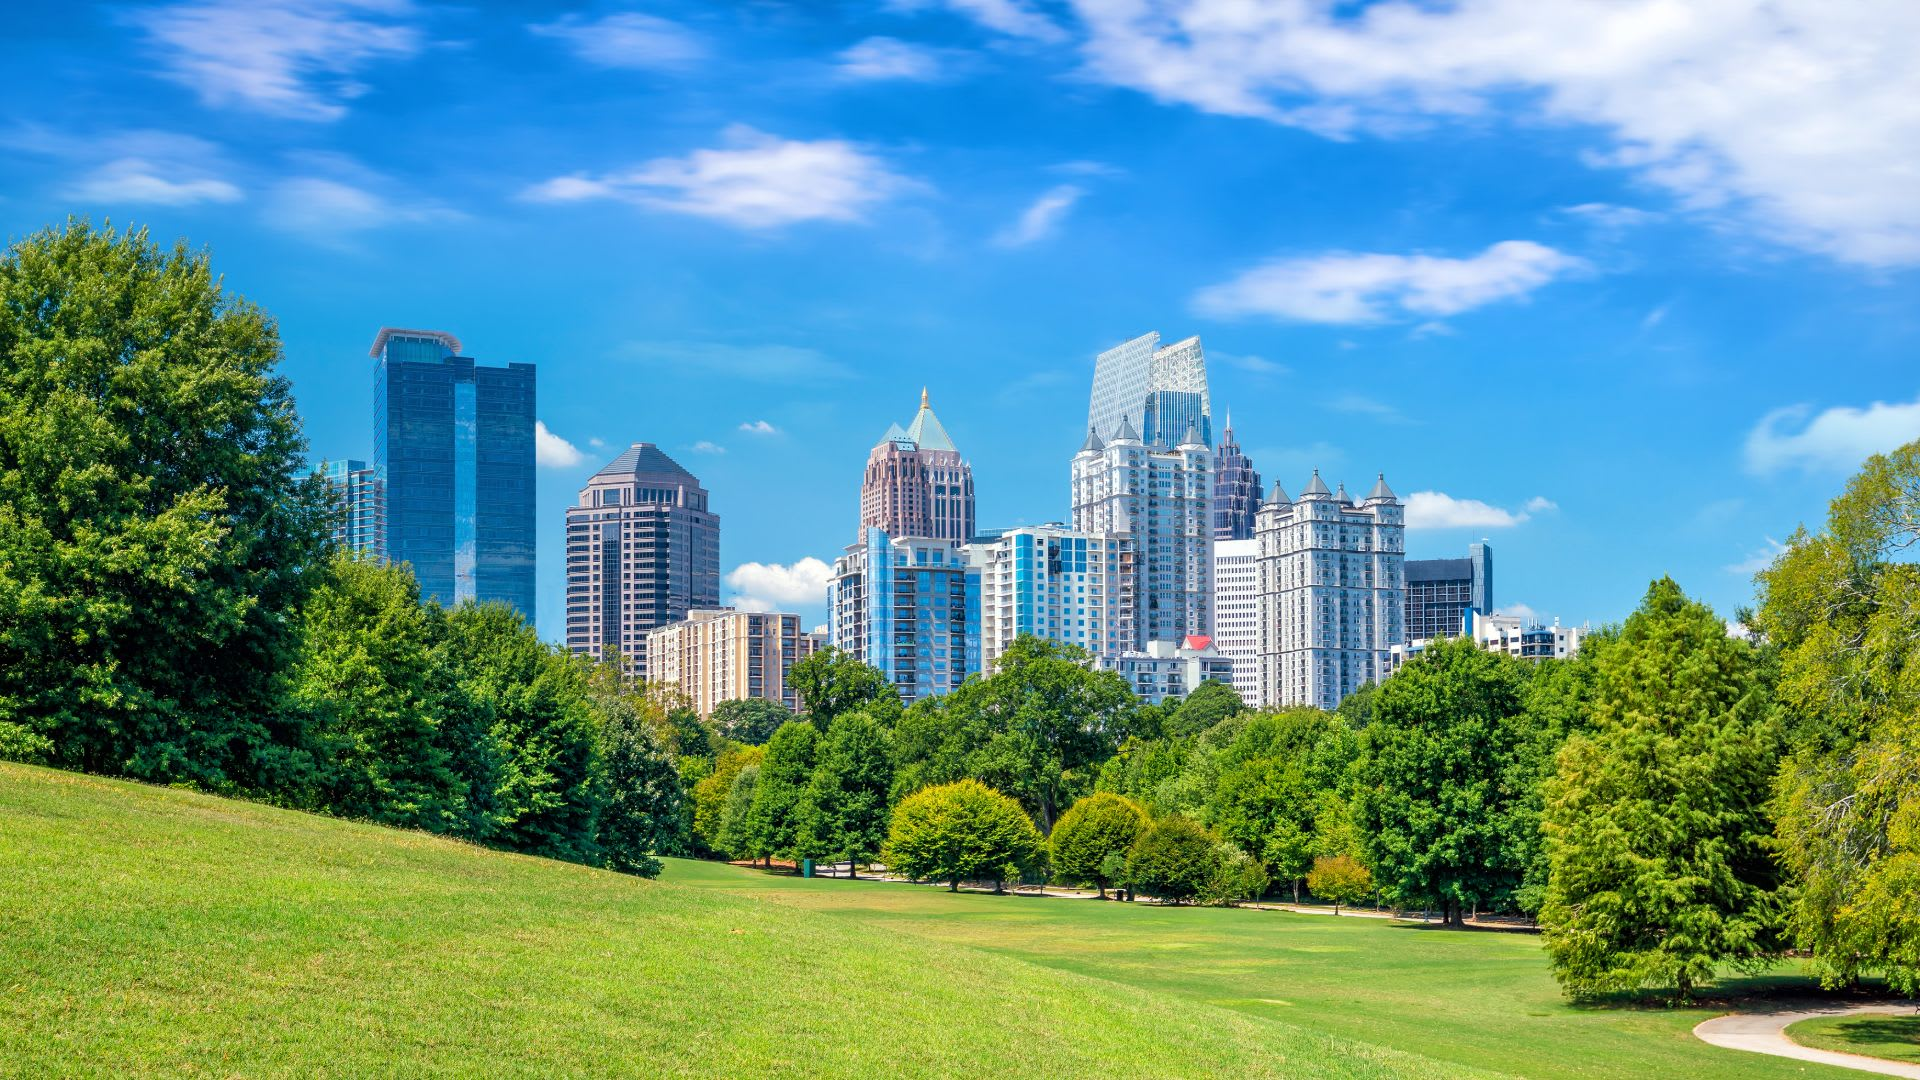 Atlanta image